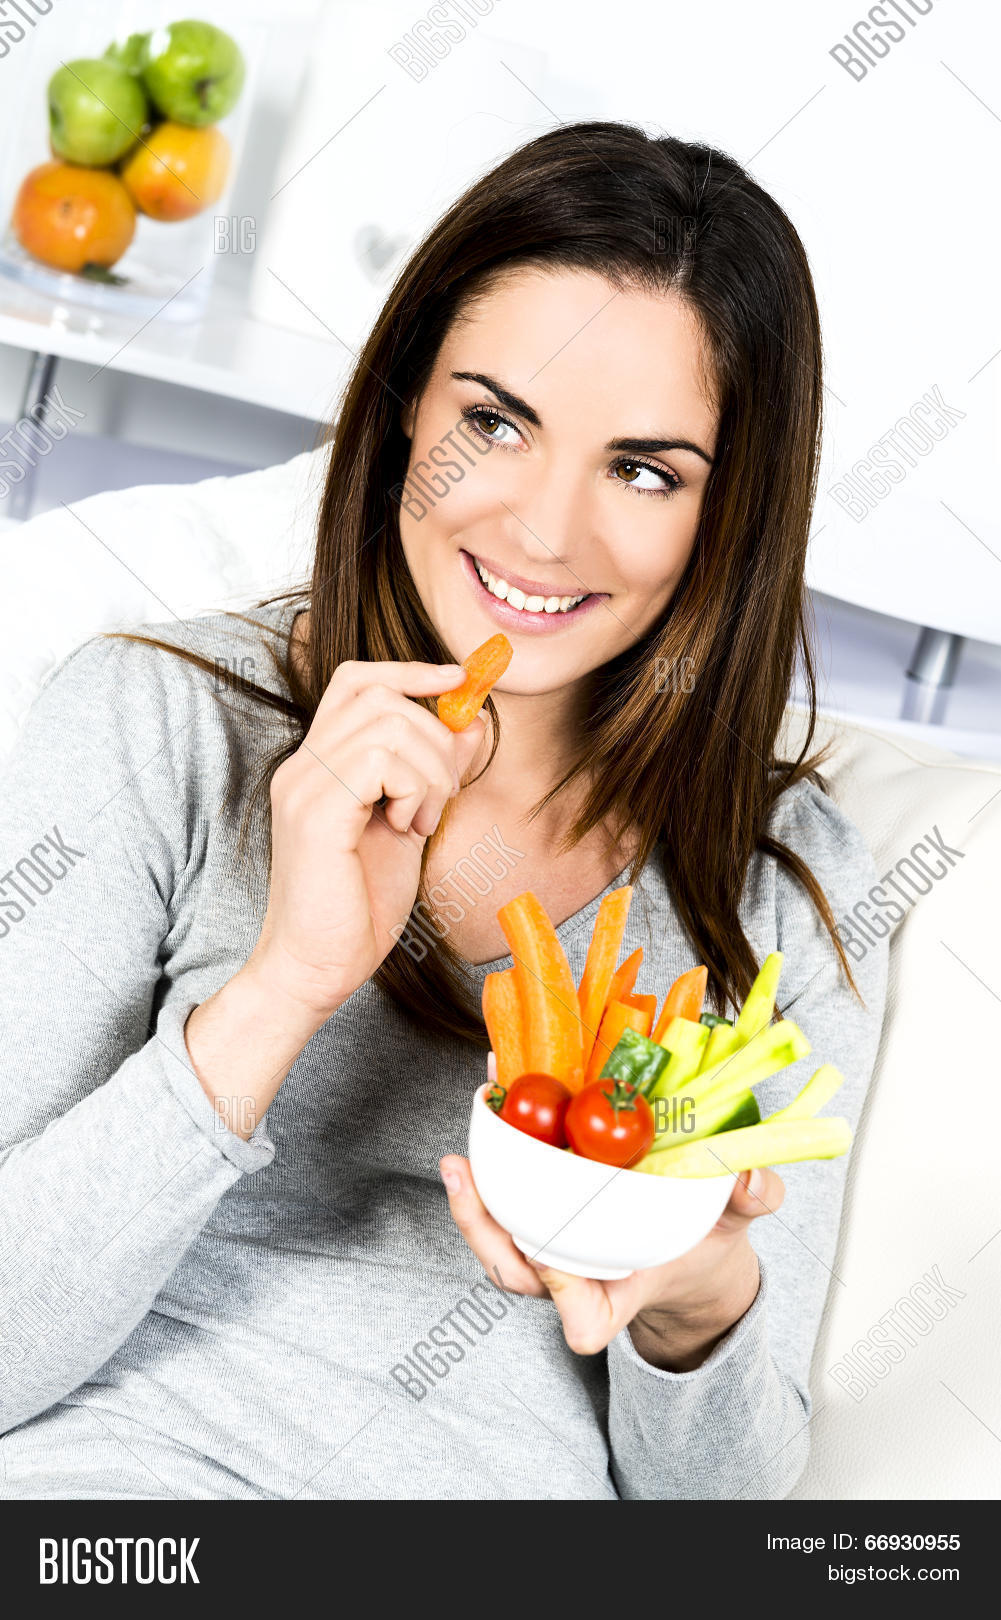 Woman Eating Salad Image Photo Free Trial Bigstock